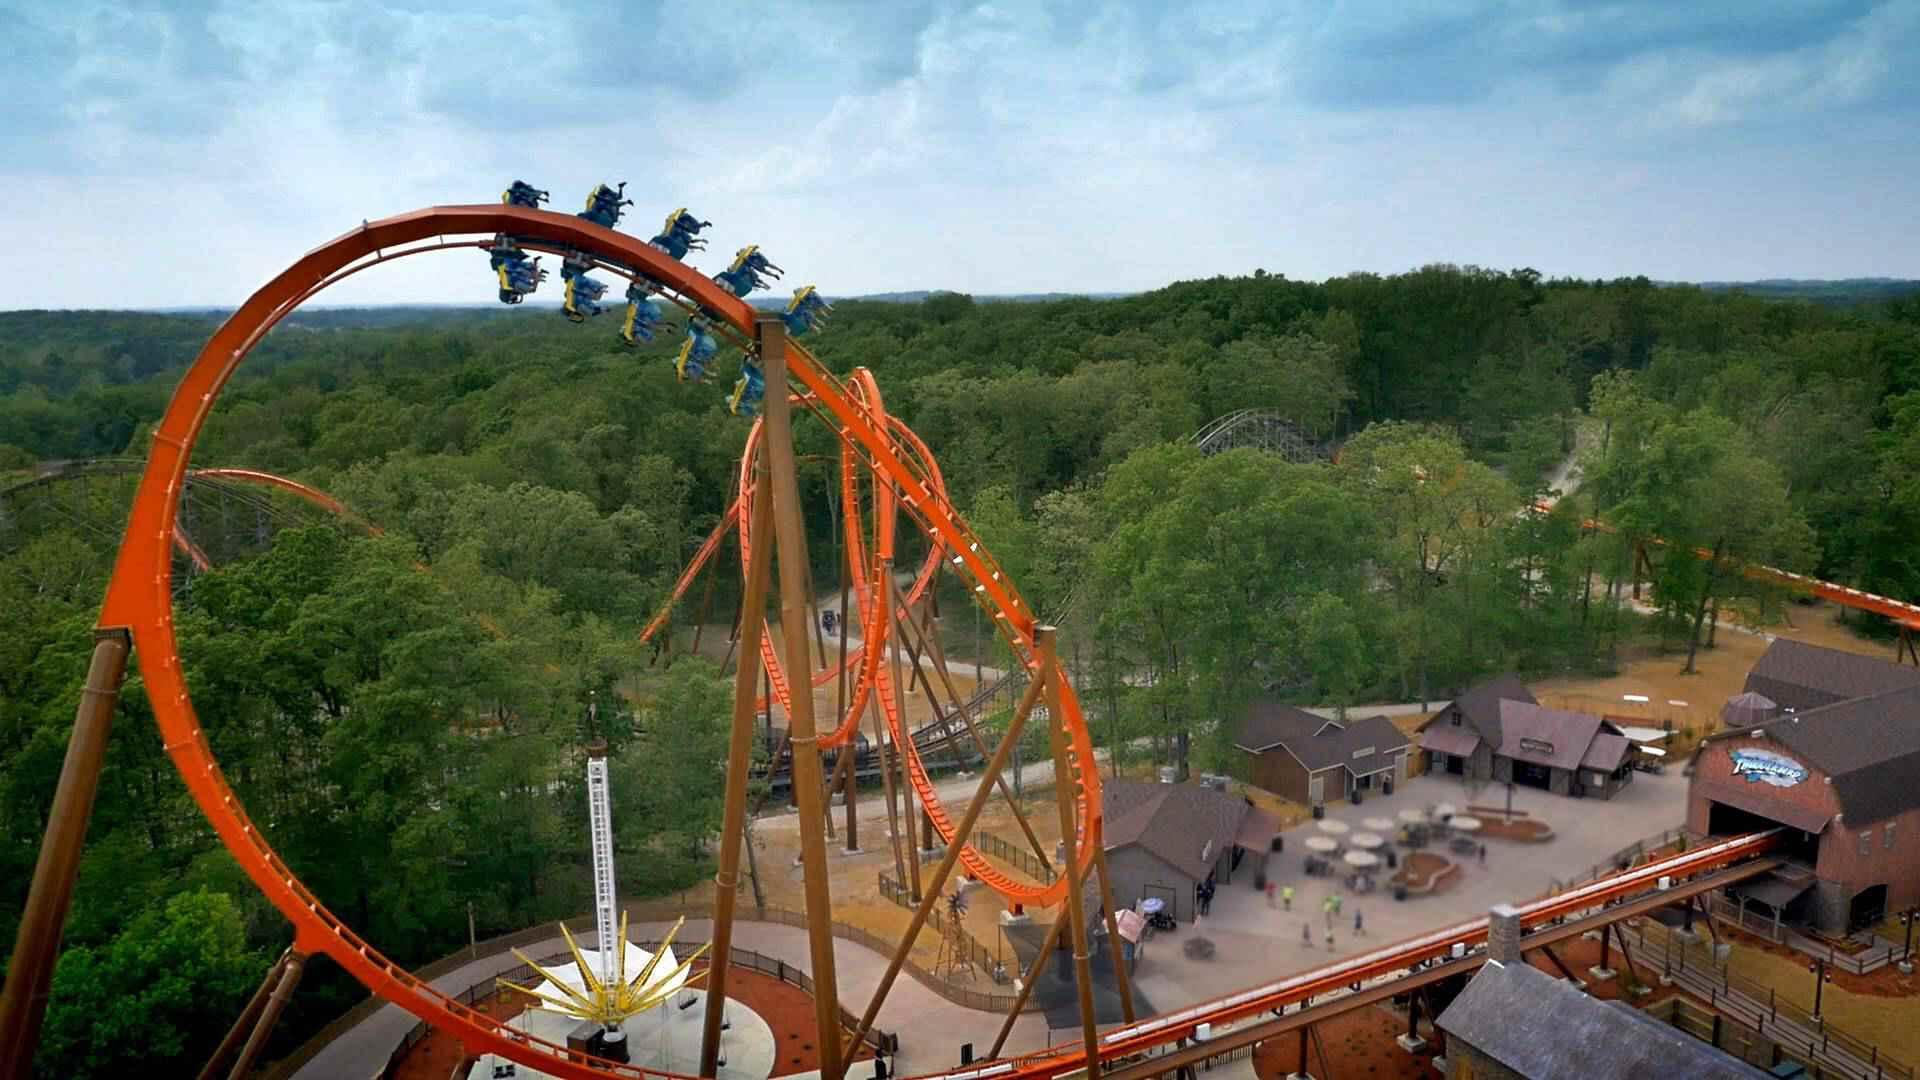 Thunderbird coaster at Holiday World